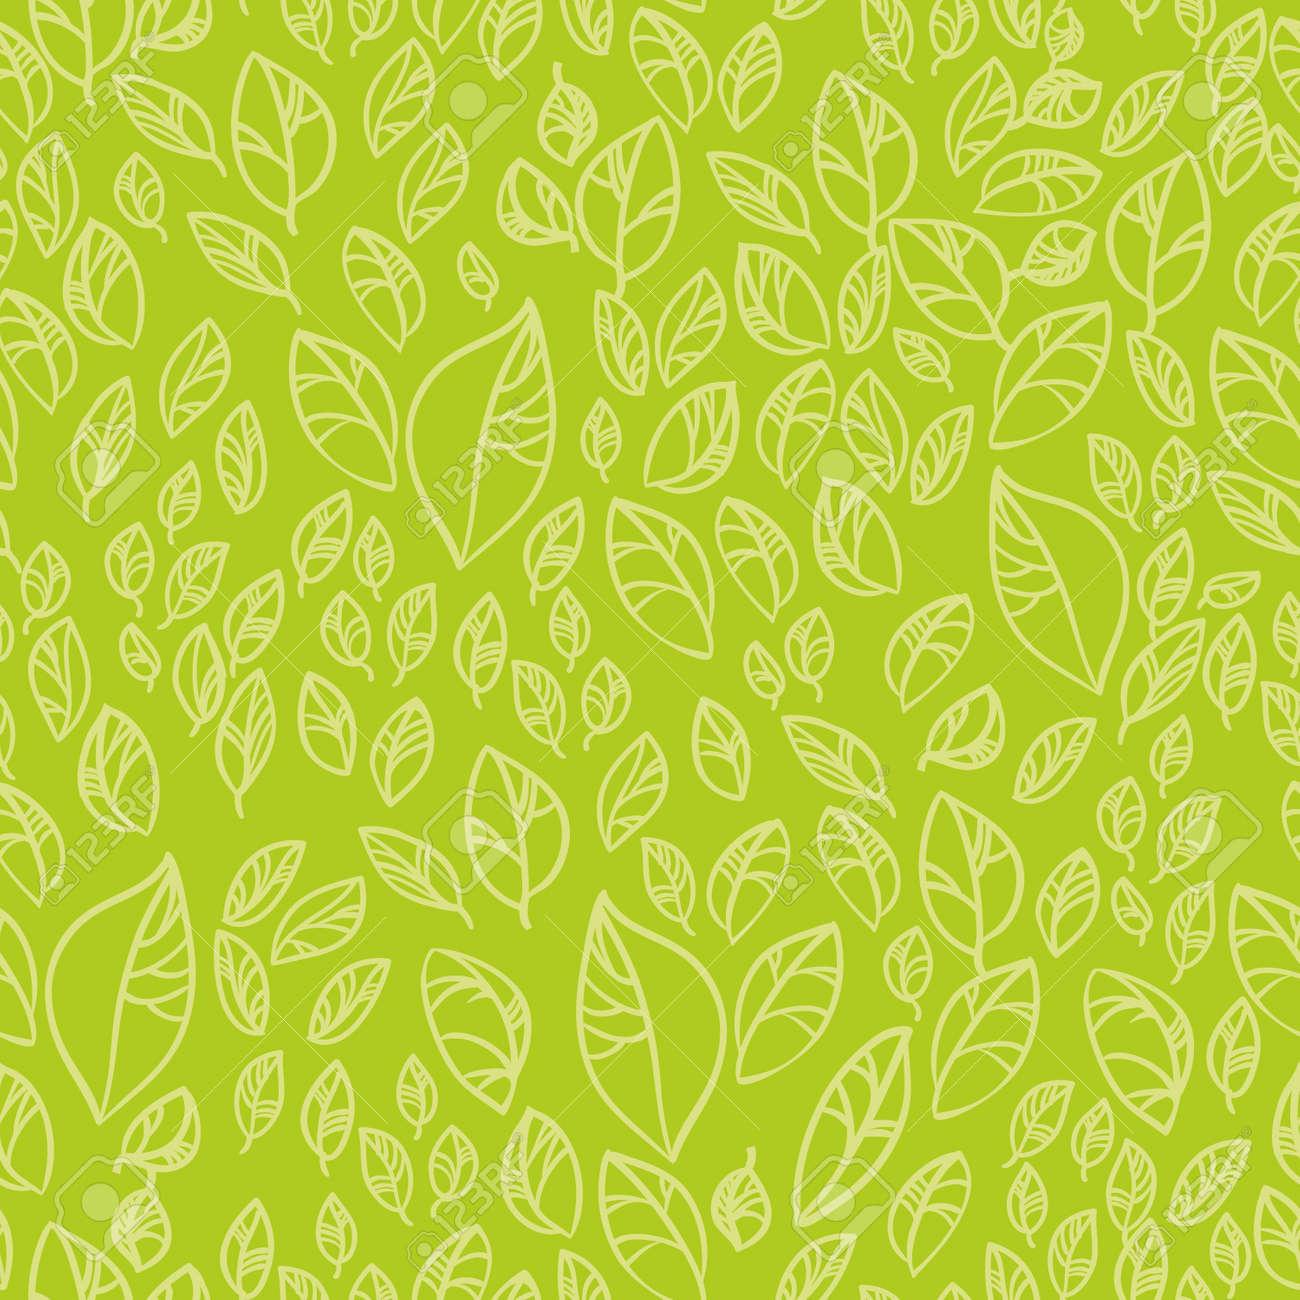 Fresh green leafs seamless pattern - 12770049